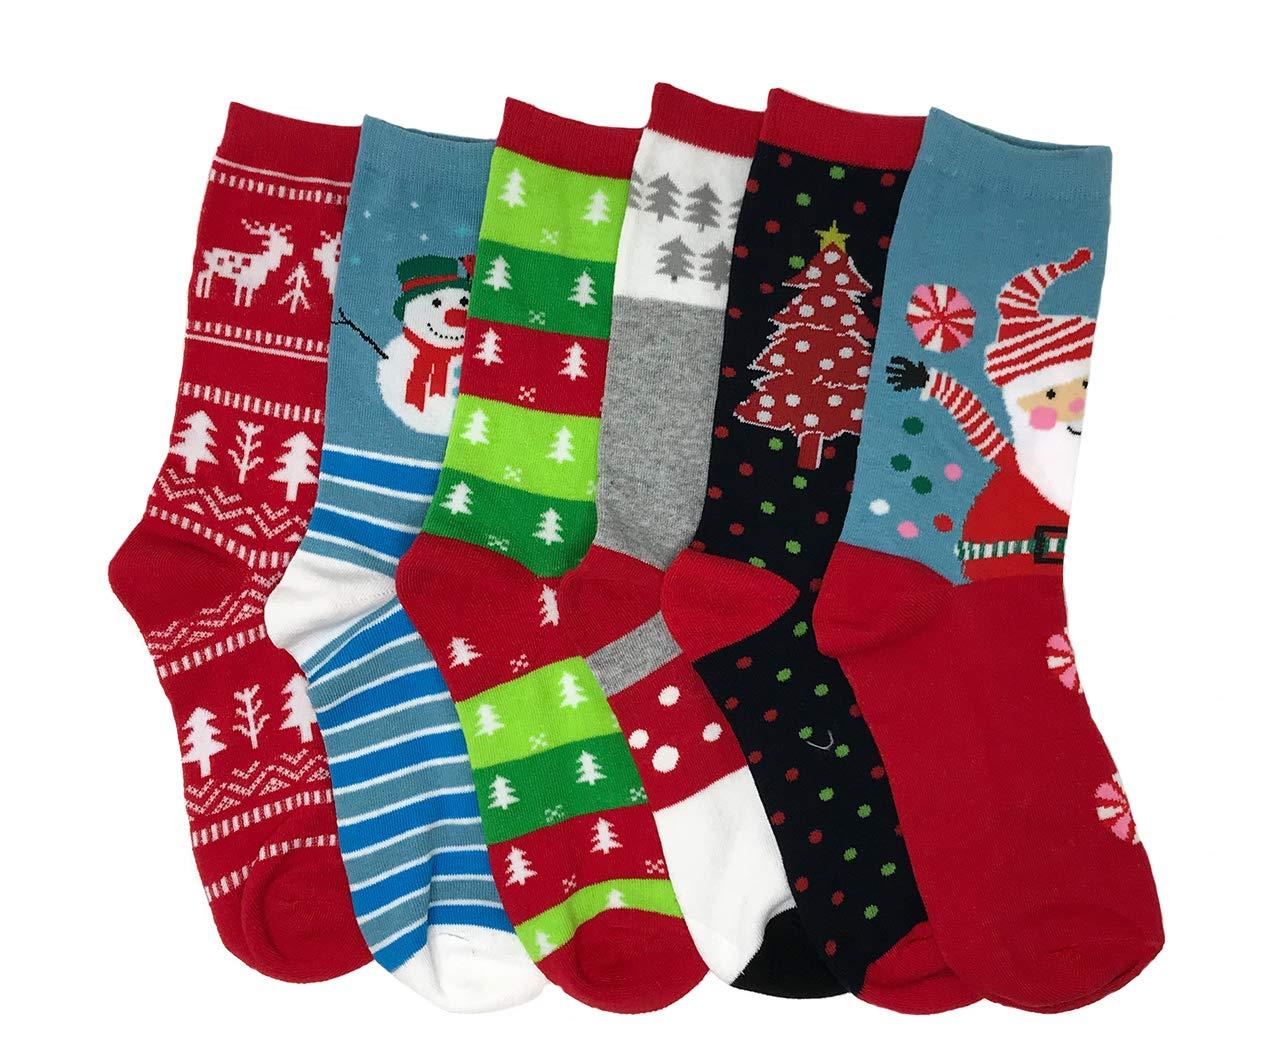 IS-6-Pairs-Crew-Socks-Printed-Fun-Colorful-Festive-Crew-Knee-Cozy-Socks-Women-Fancy-Christmas-Holiday-Design-Soft